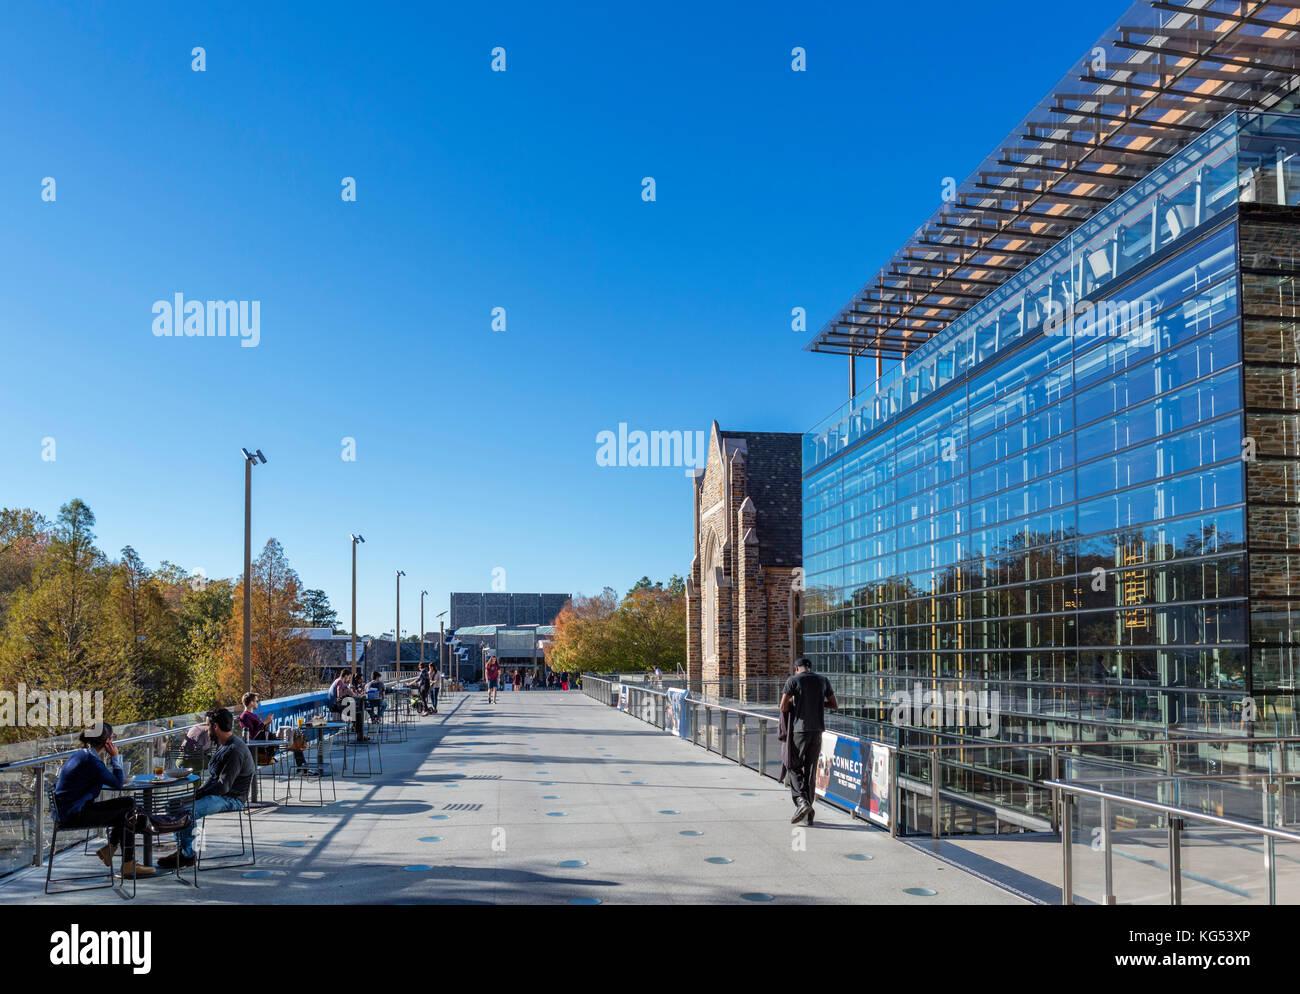 The Brodhead Center at Duke University, Durham, North Carolina, USA. - Stock Image